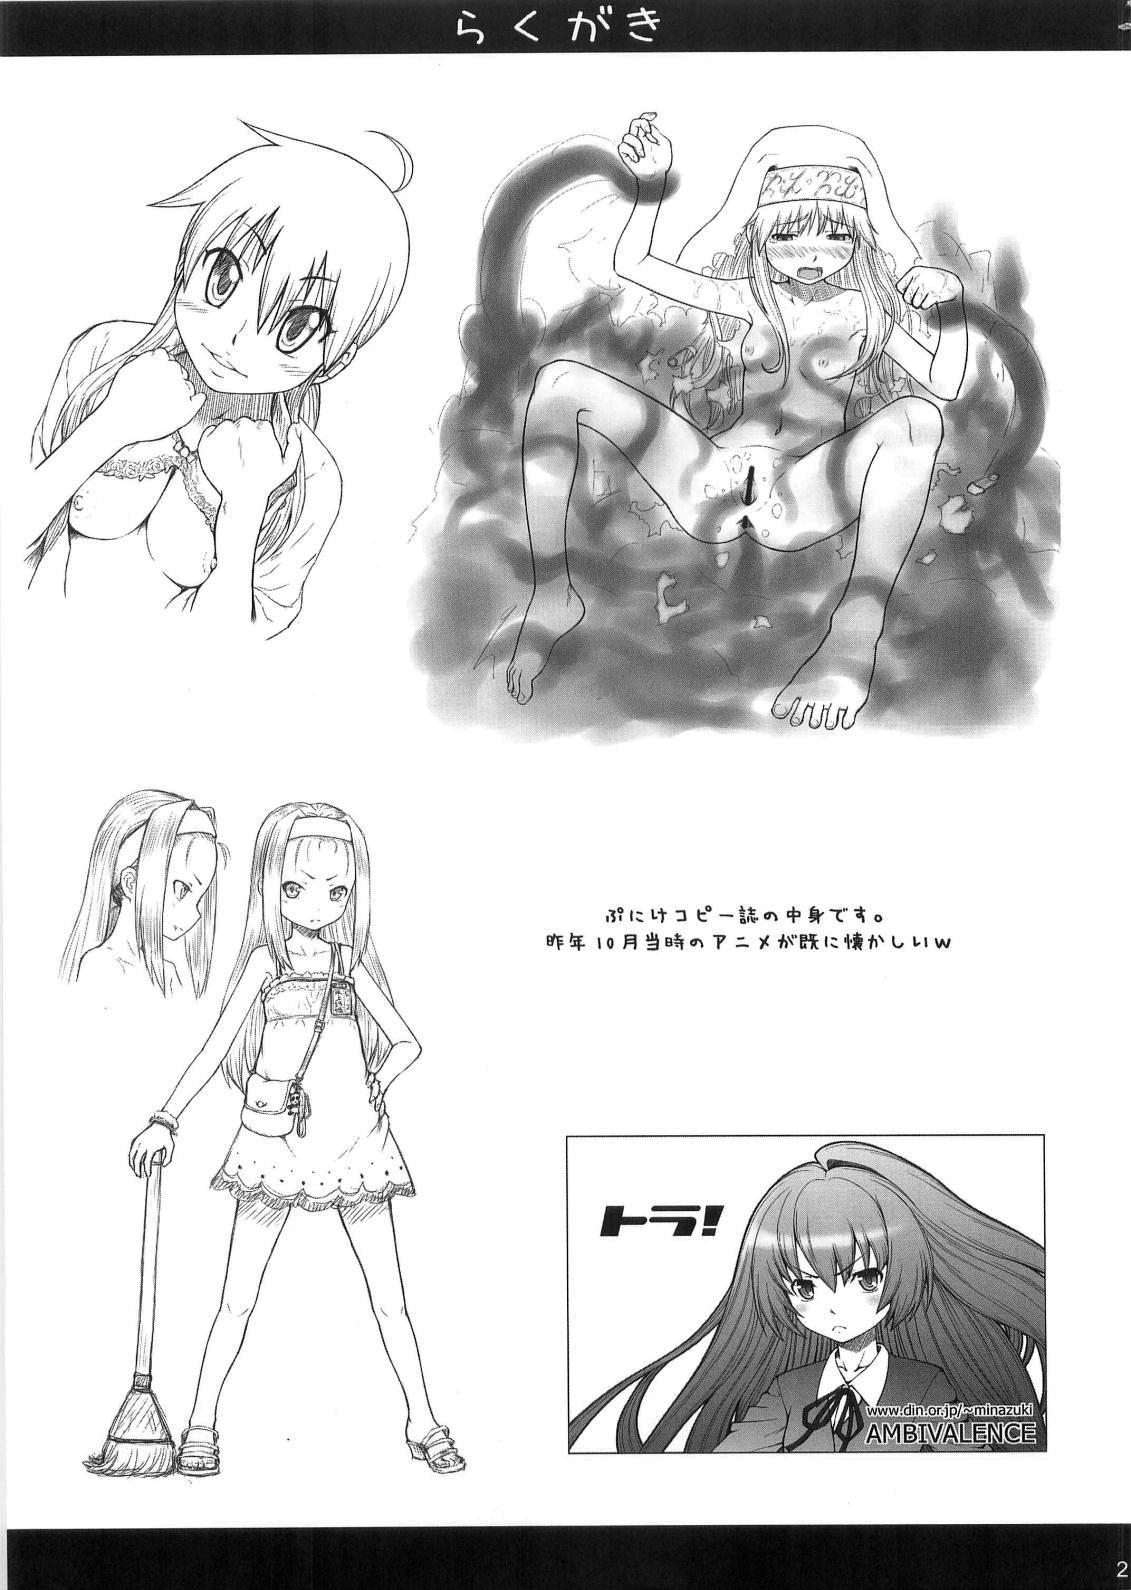 Kagamin wa Ore no Yome 2 | Kagamin is my Wife 2 19